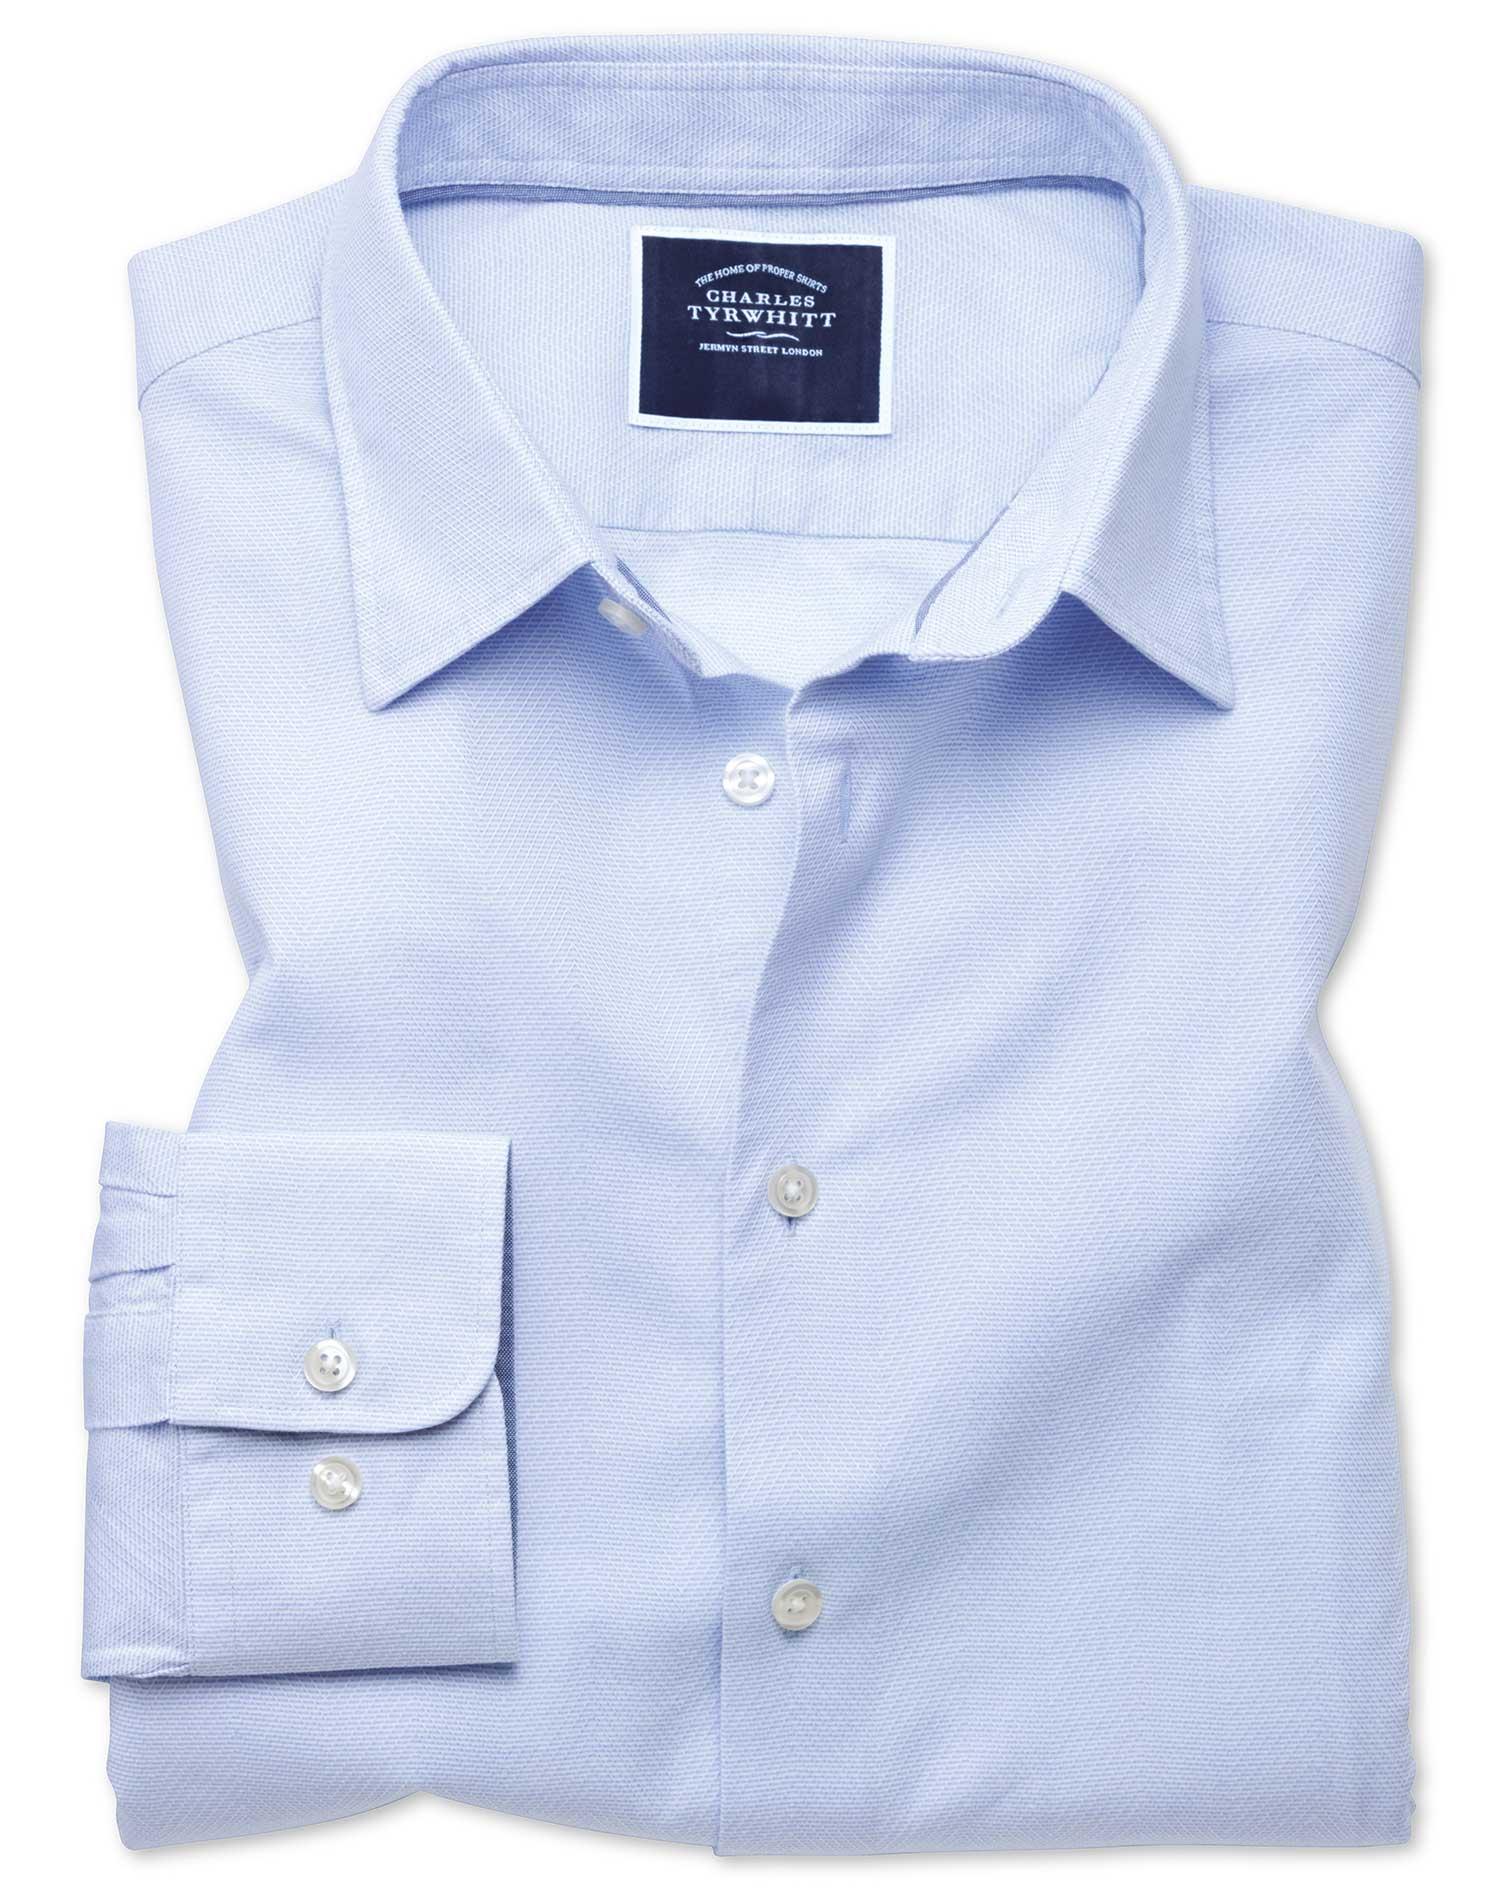 Slim Fit Sky Blue Soft Texture Herringbone Cotton Shirt Single Cuff Size XS by Charles Tyrwhitt